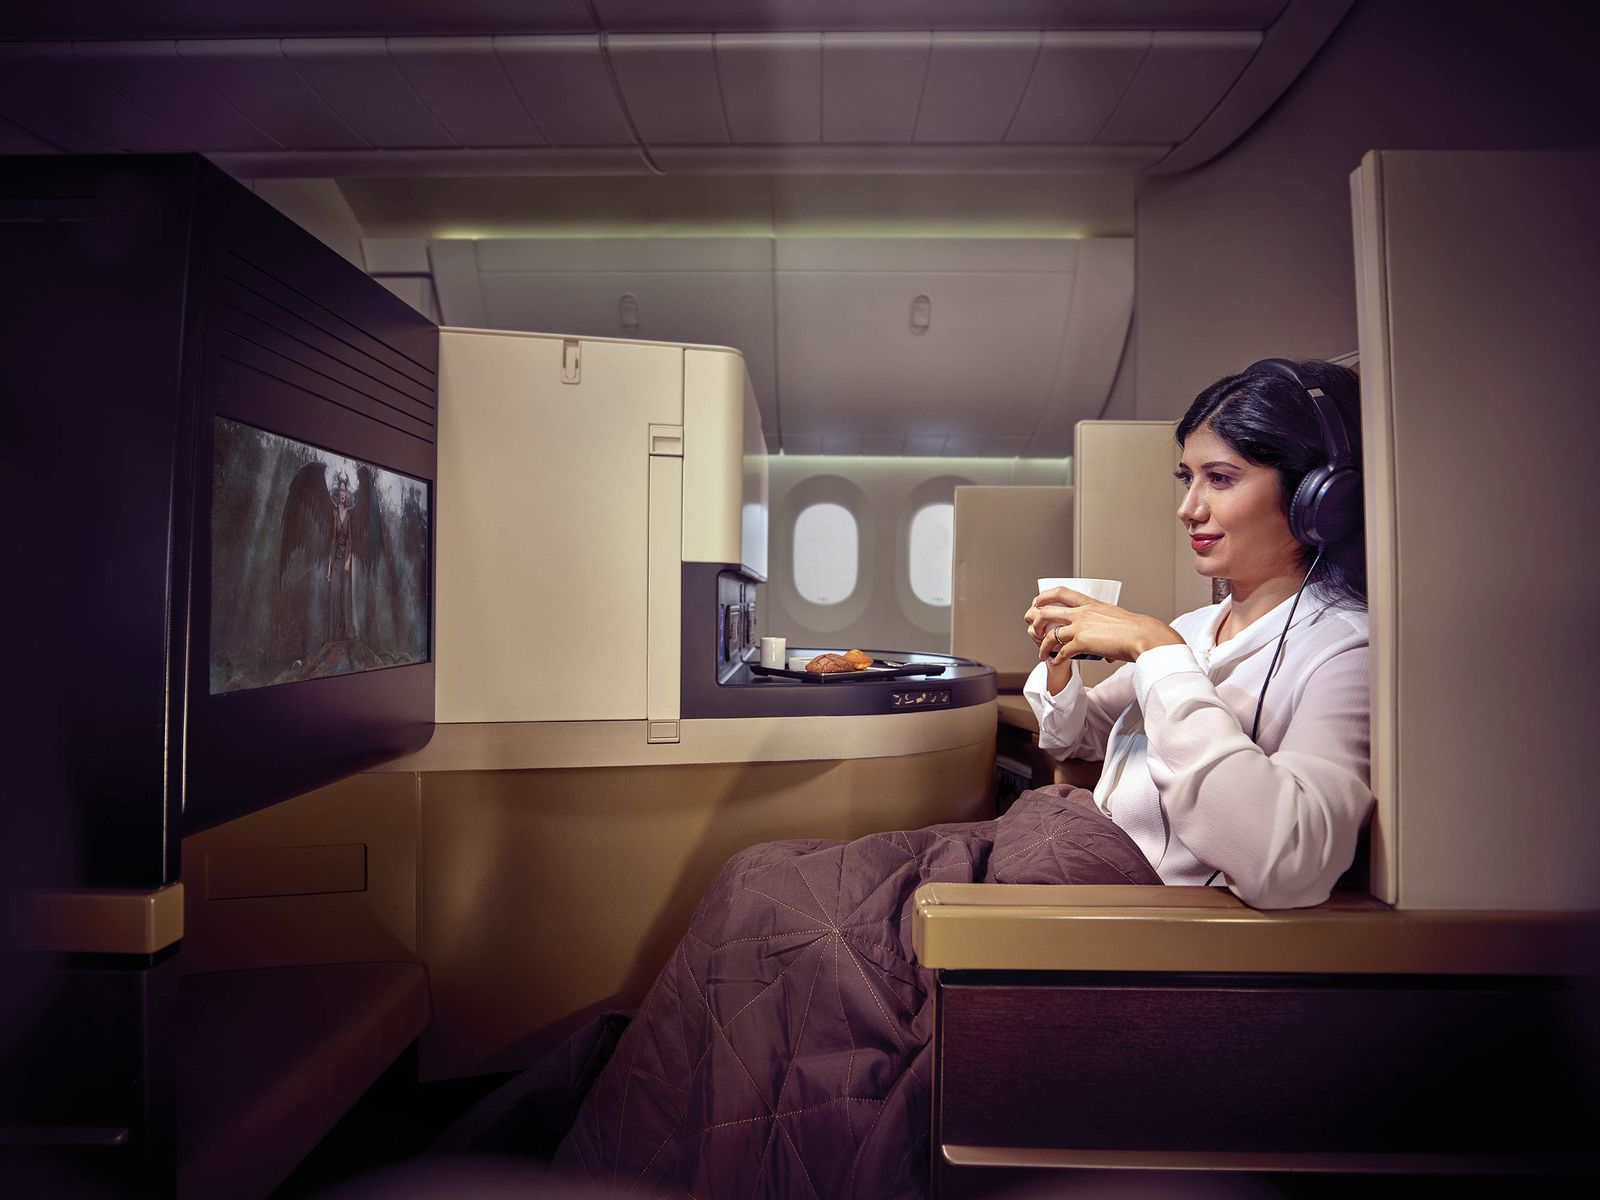 Business Class Flugprodukte / Etihad Airways - Business Studio